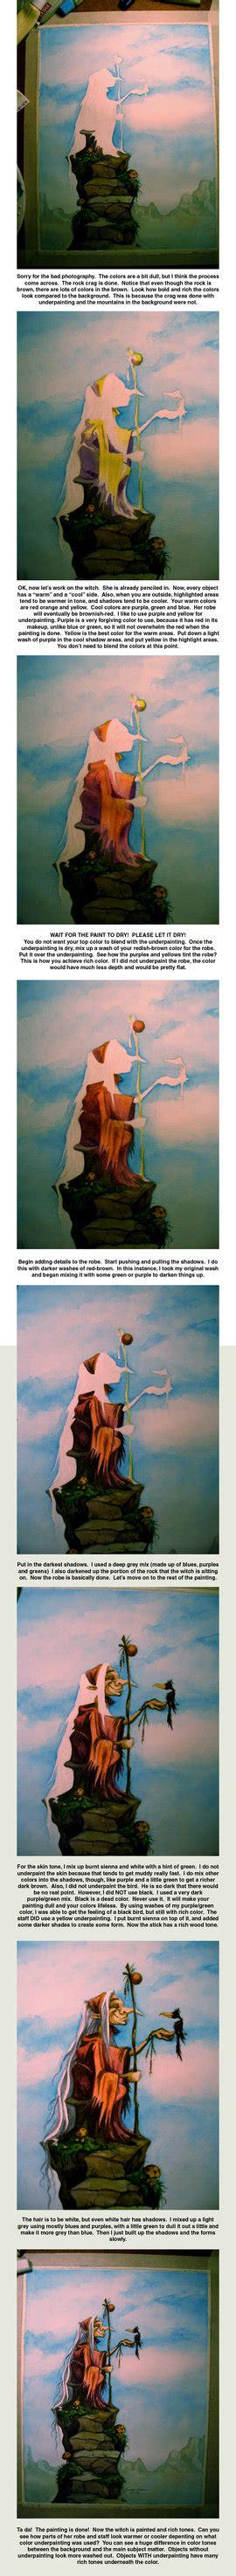 watercolor underpainting tutorial underpainting tutorial by isynia artessa on deviantart